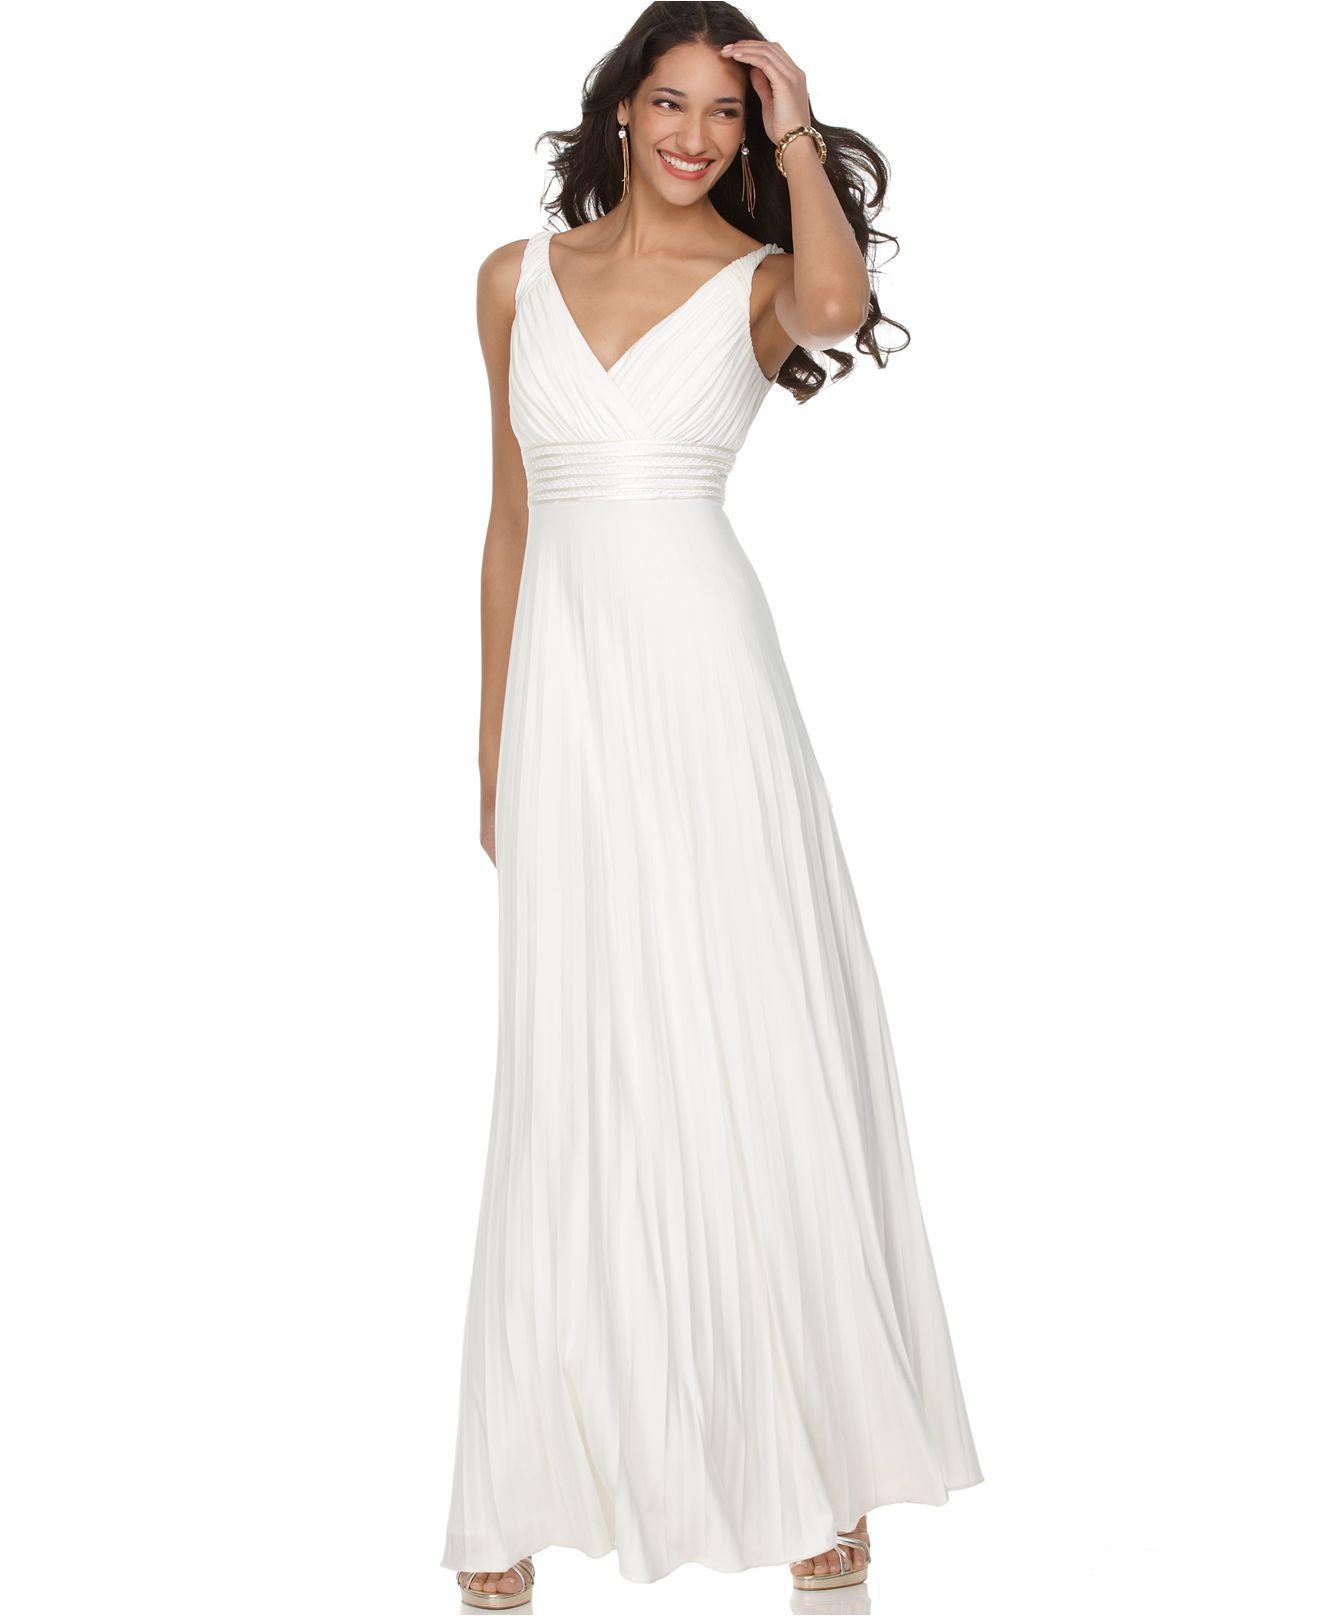 Pin On Dresses Top Picks